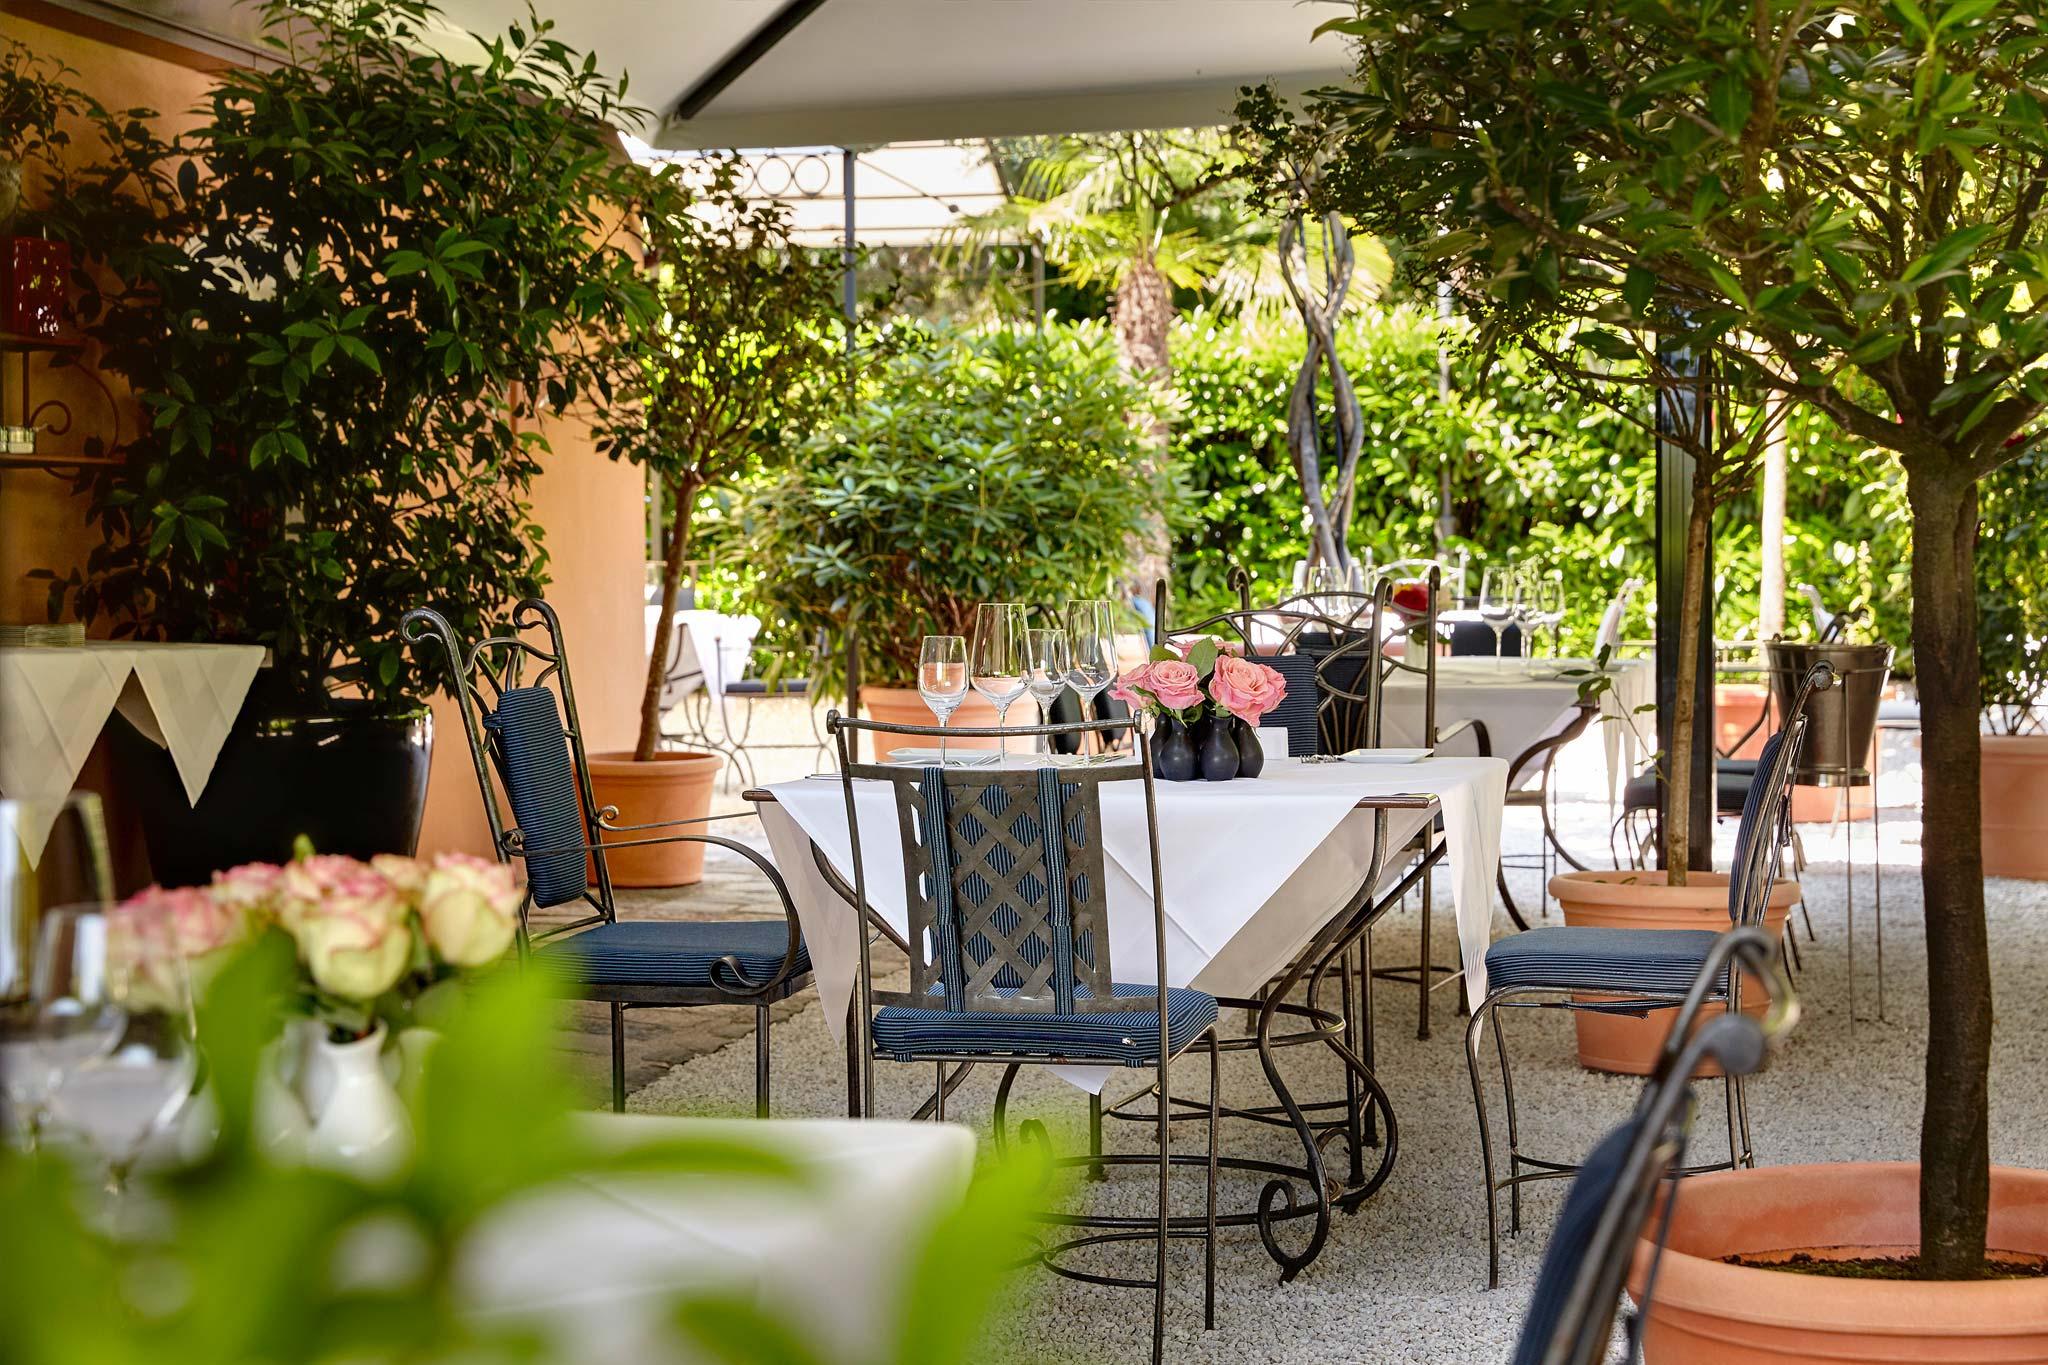 garten-restaurant-zum-buberlgut-8-b